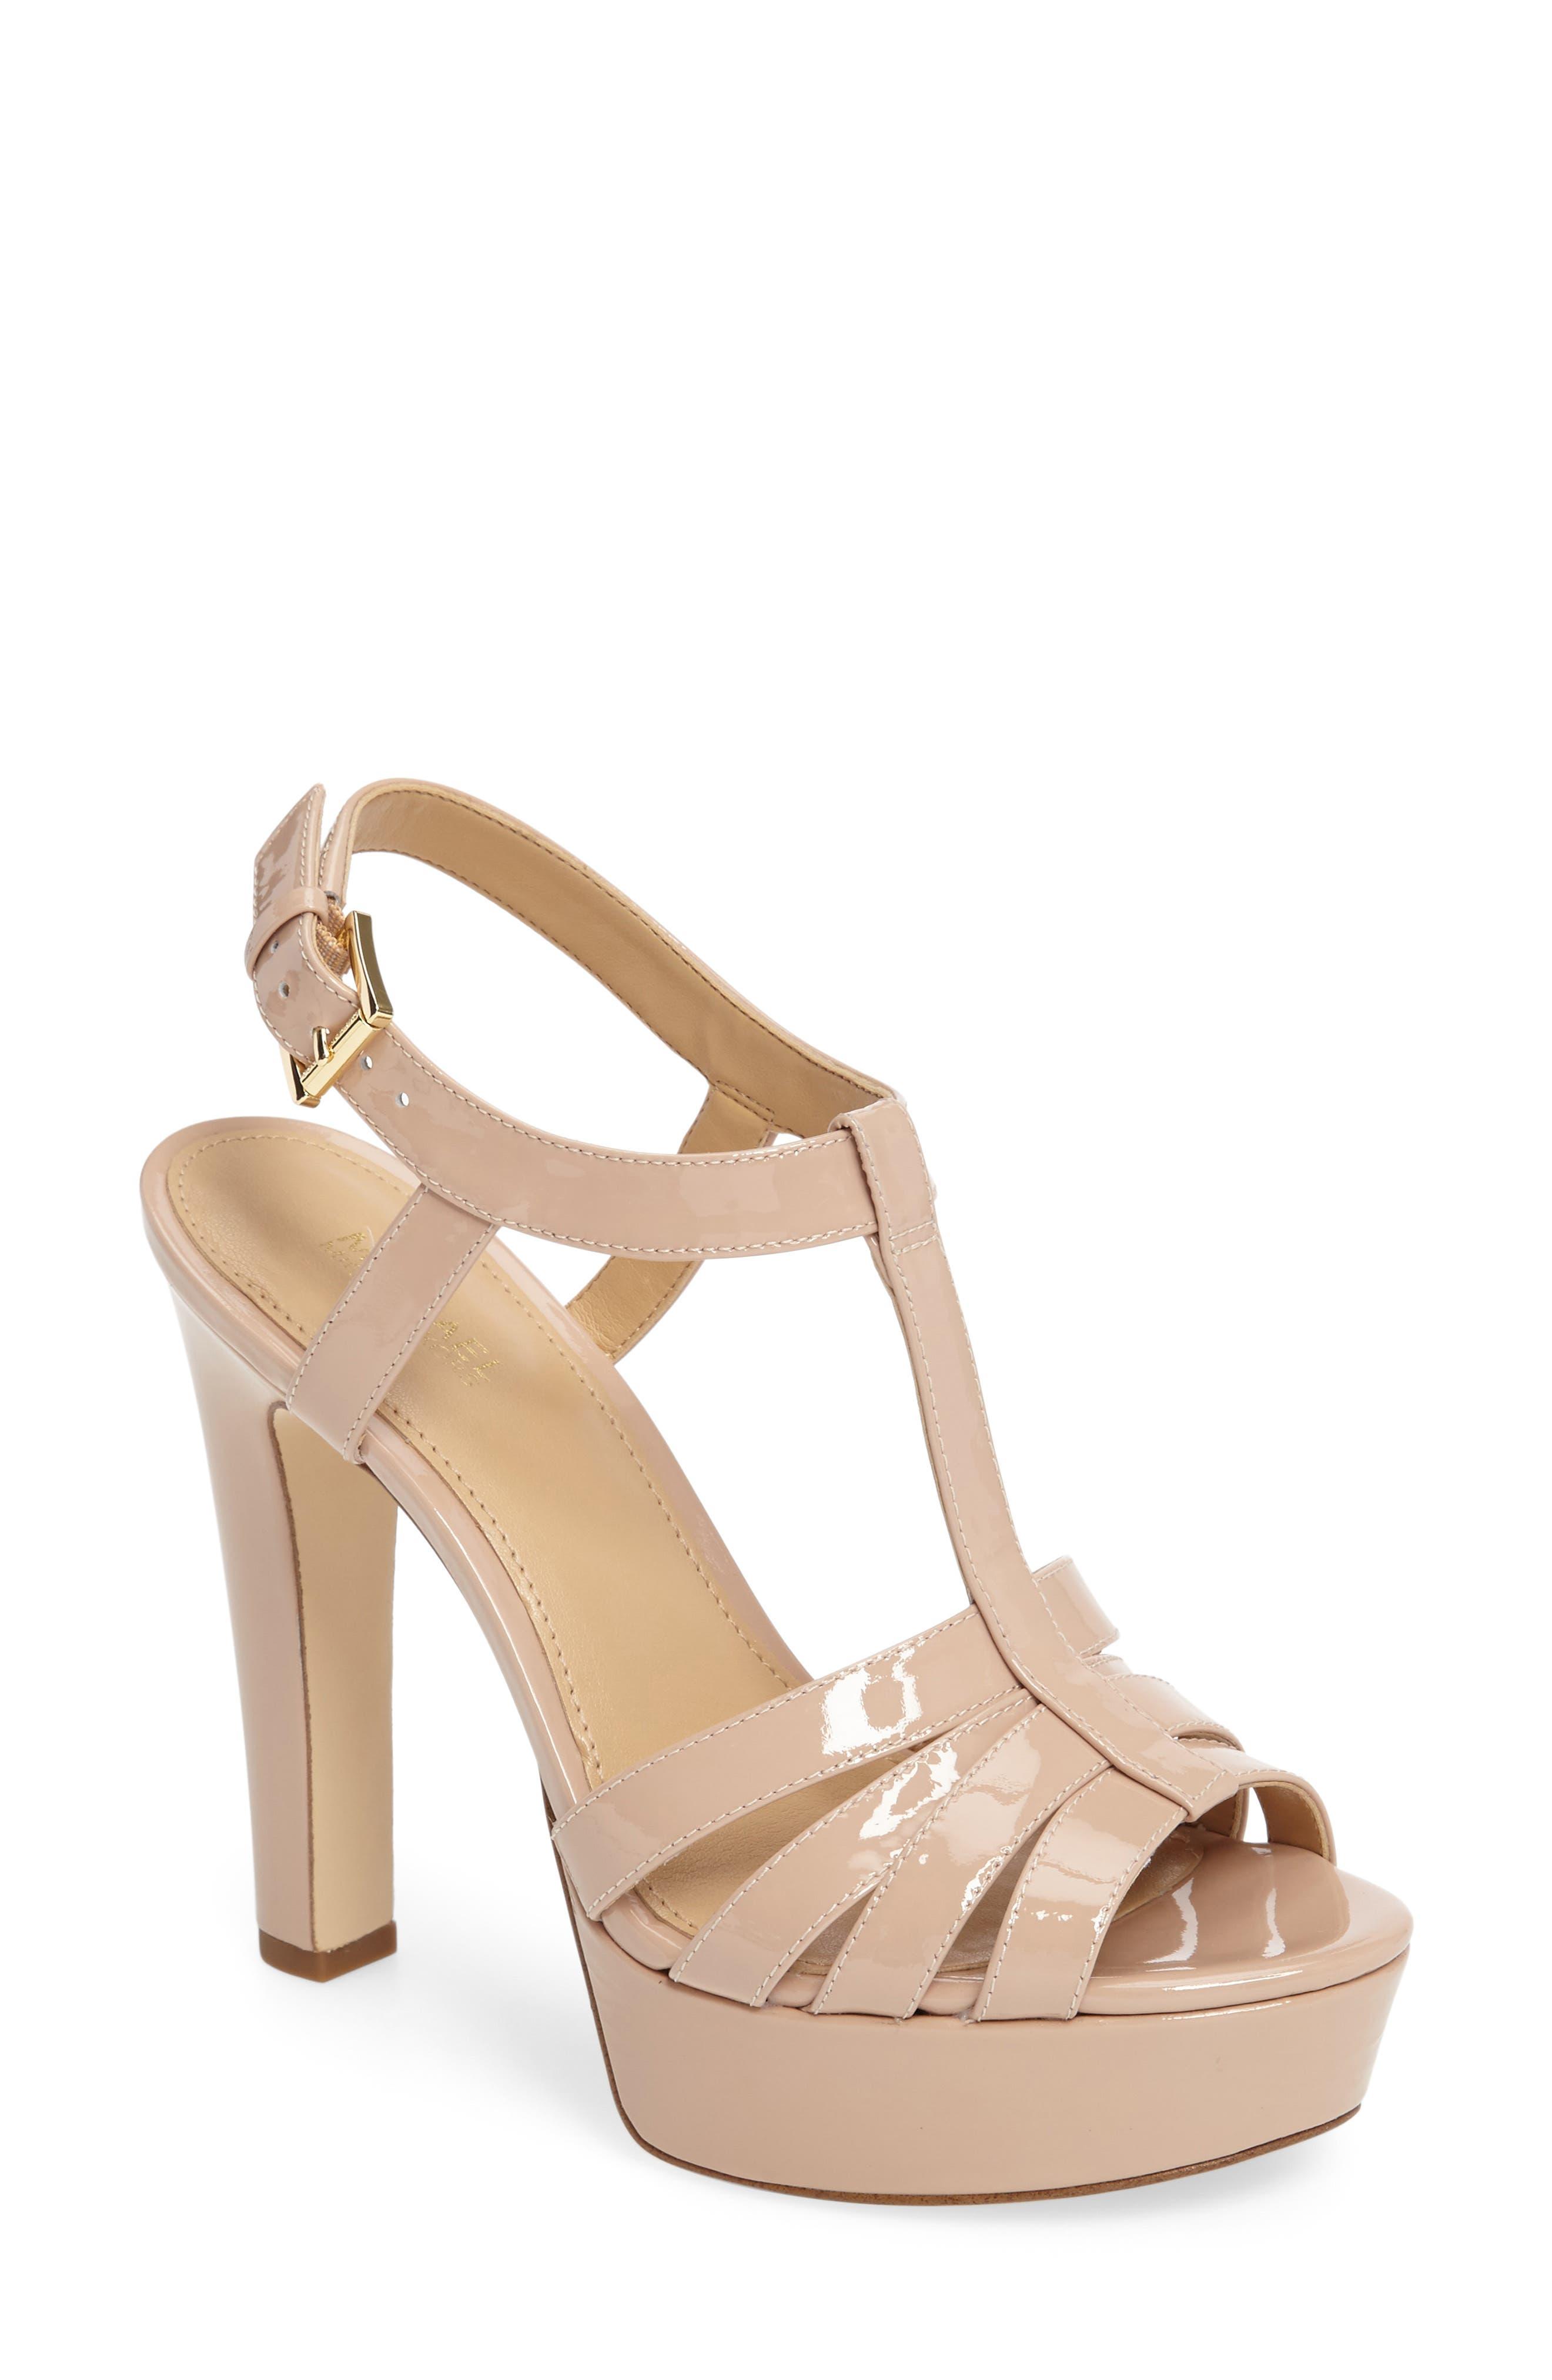 Main Image - MICHAEL Michael Kors Catalina Platform Sandal (Women)